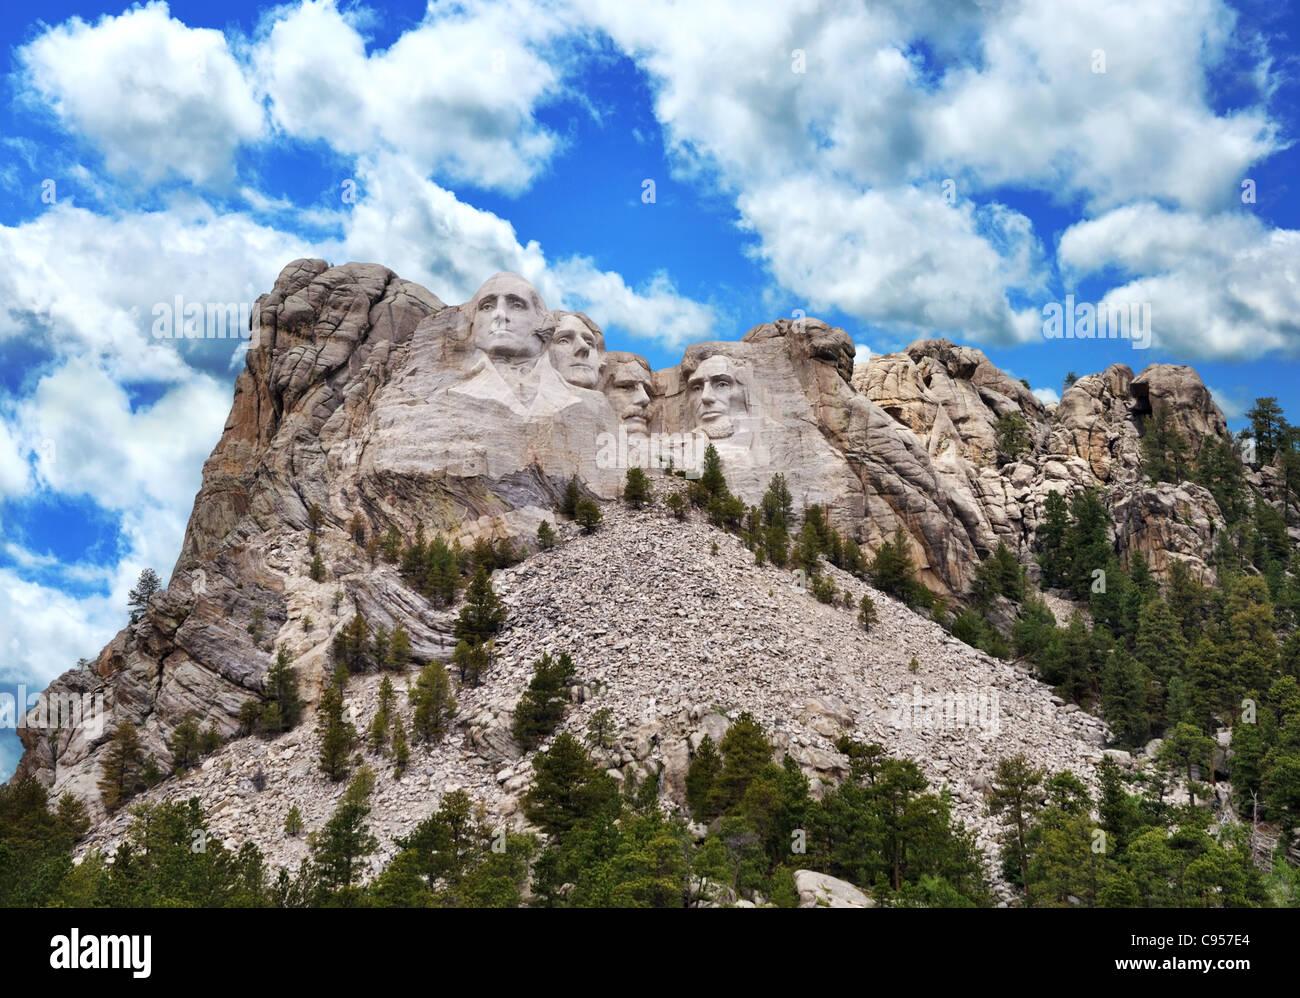 Presidential Sculpture At Mount Rushmore National Monument, South Dakota. - Stock Image